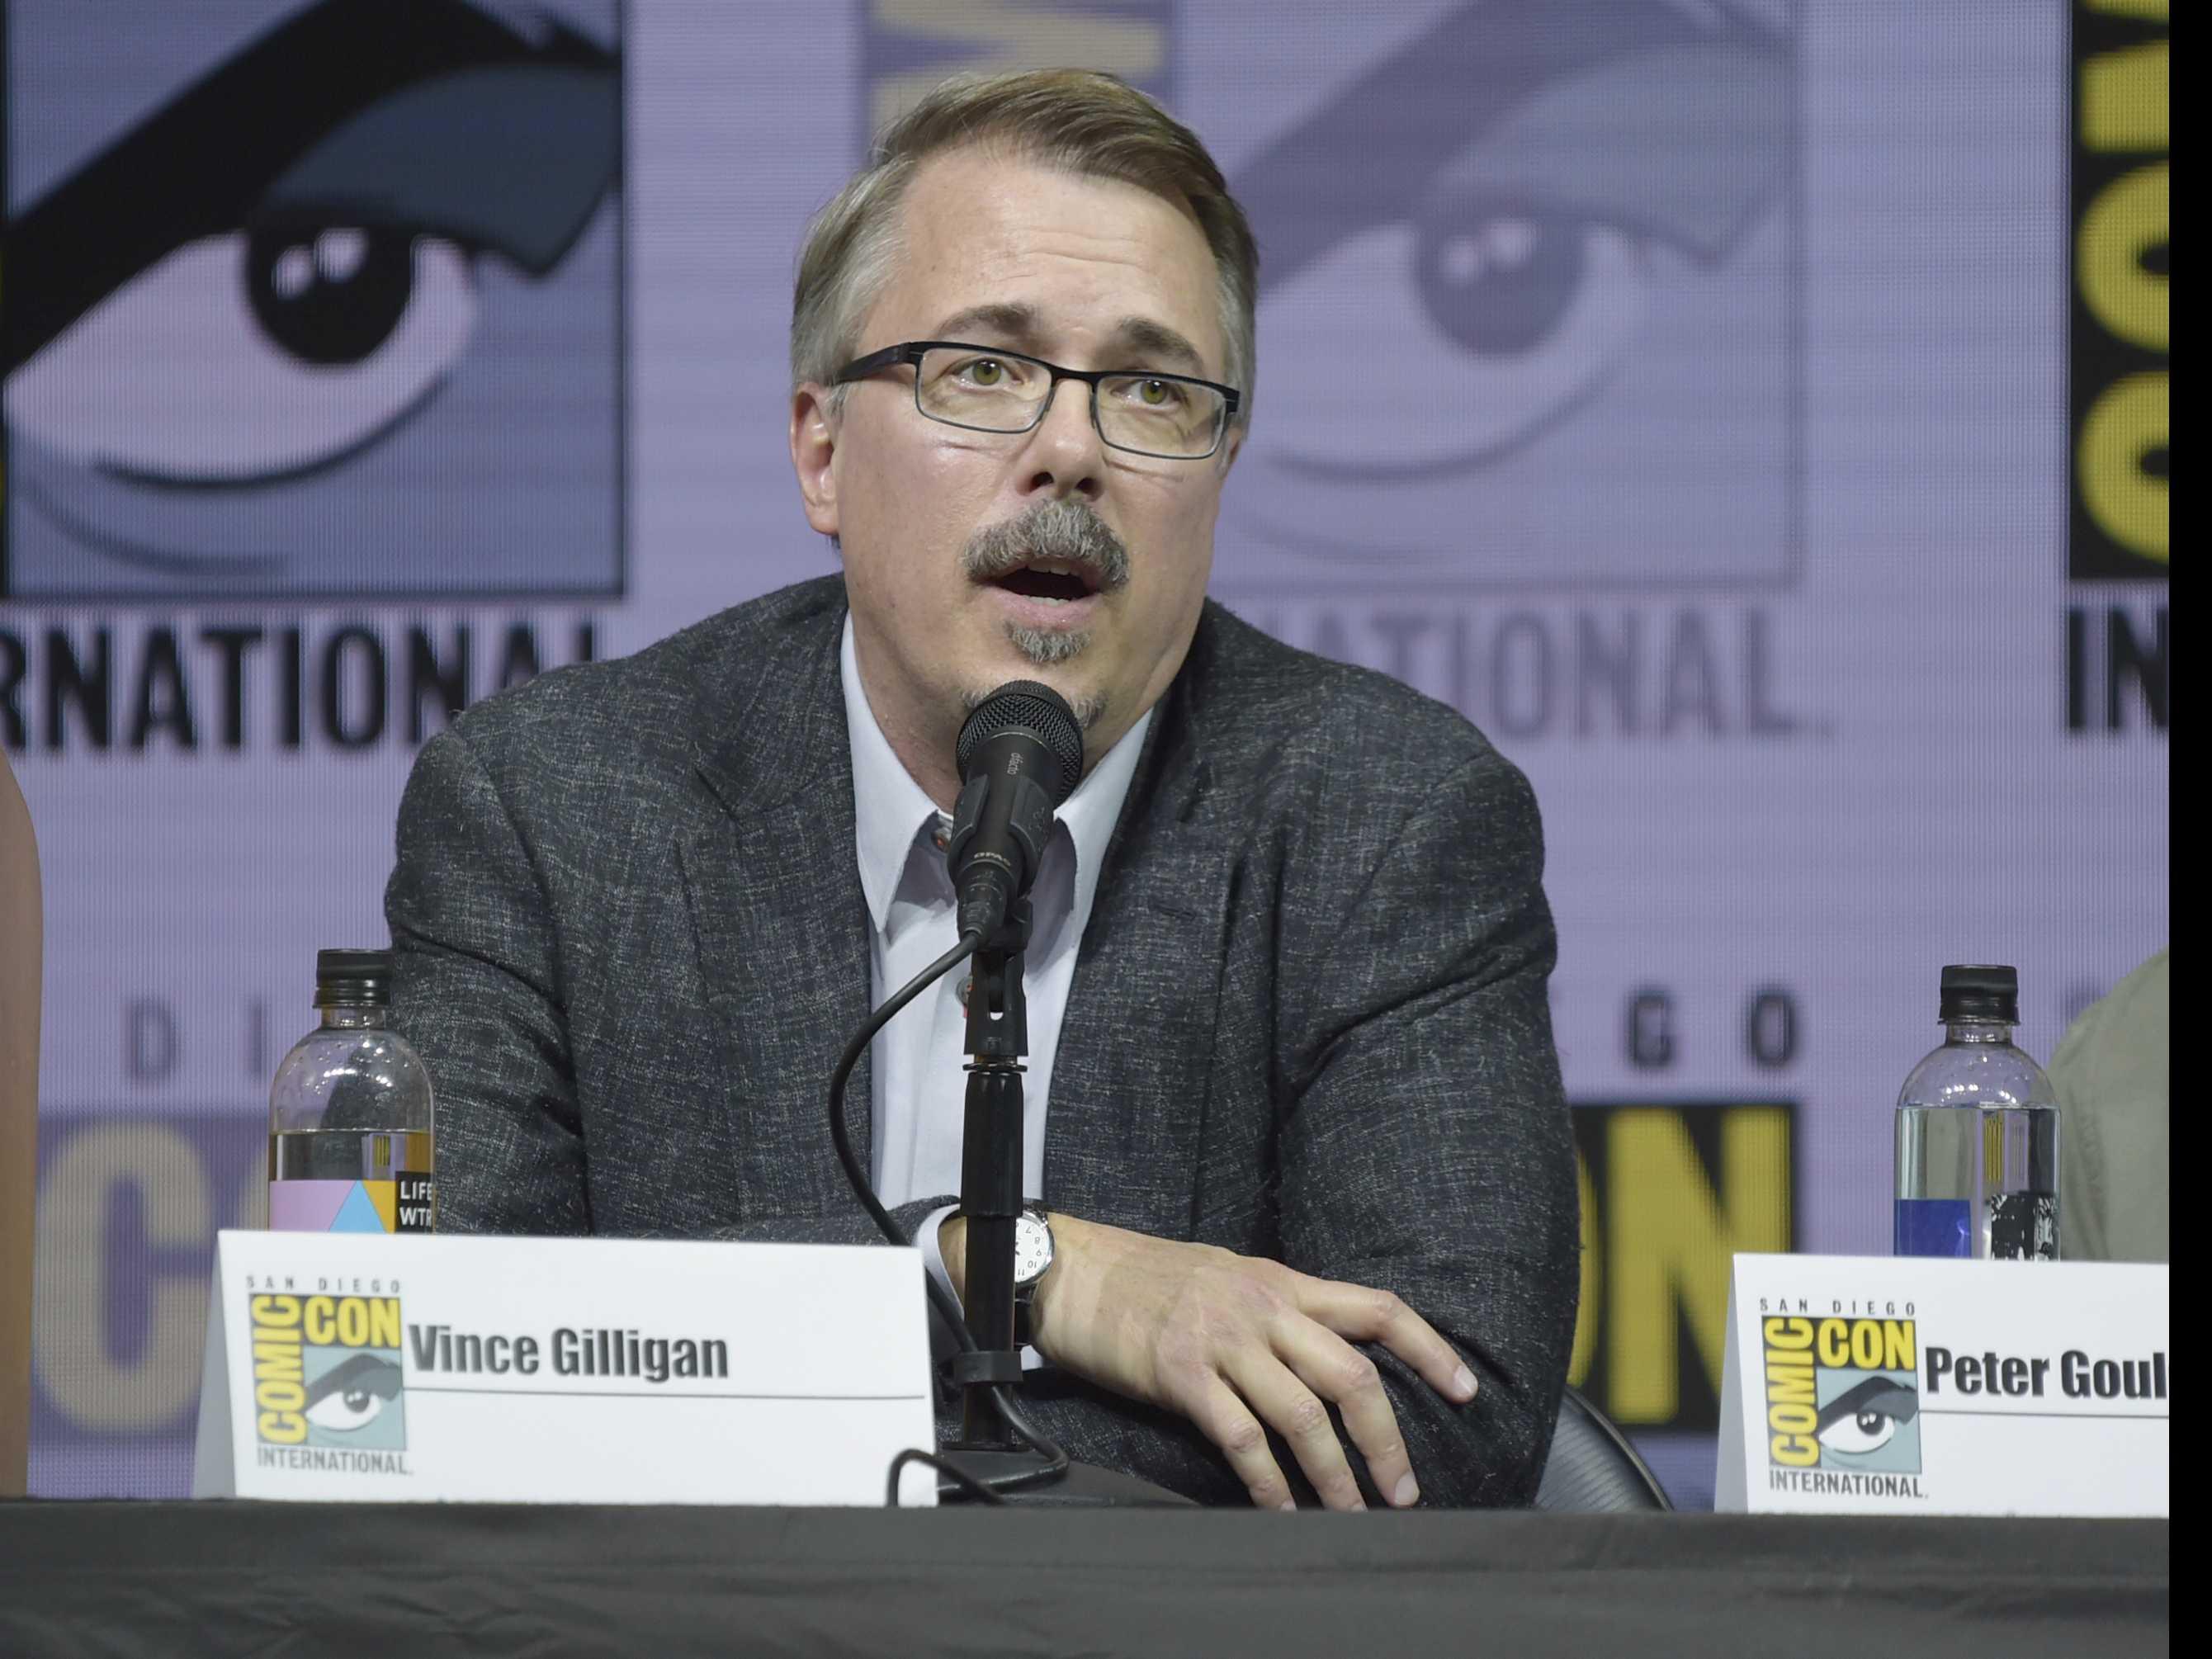 Bryan Cranston Confirms 'Breaking Bad' Movie in Development